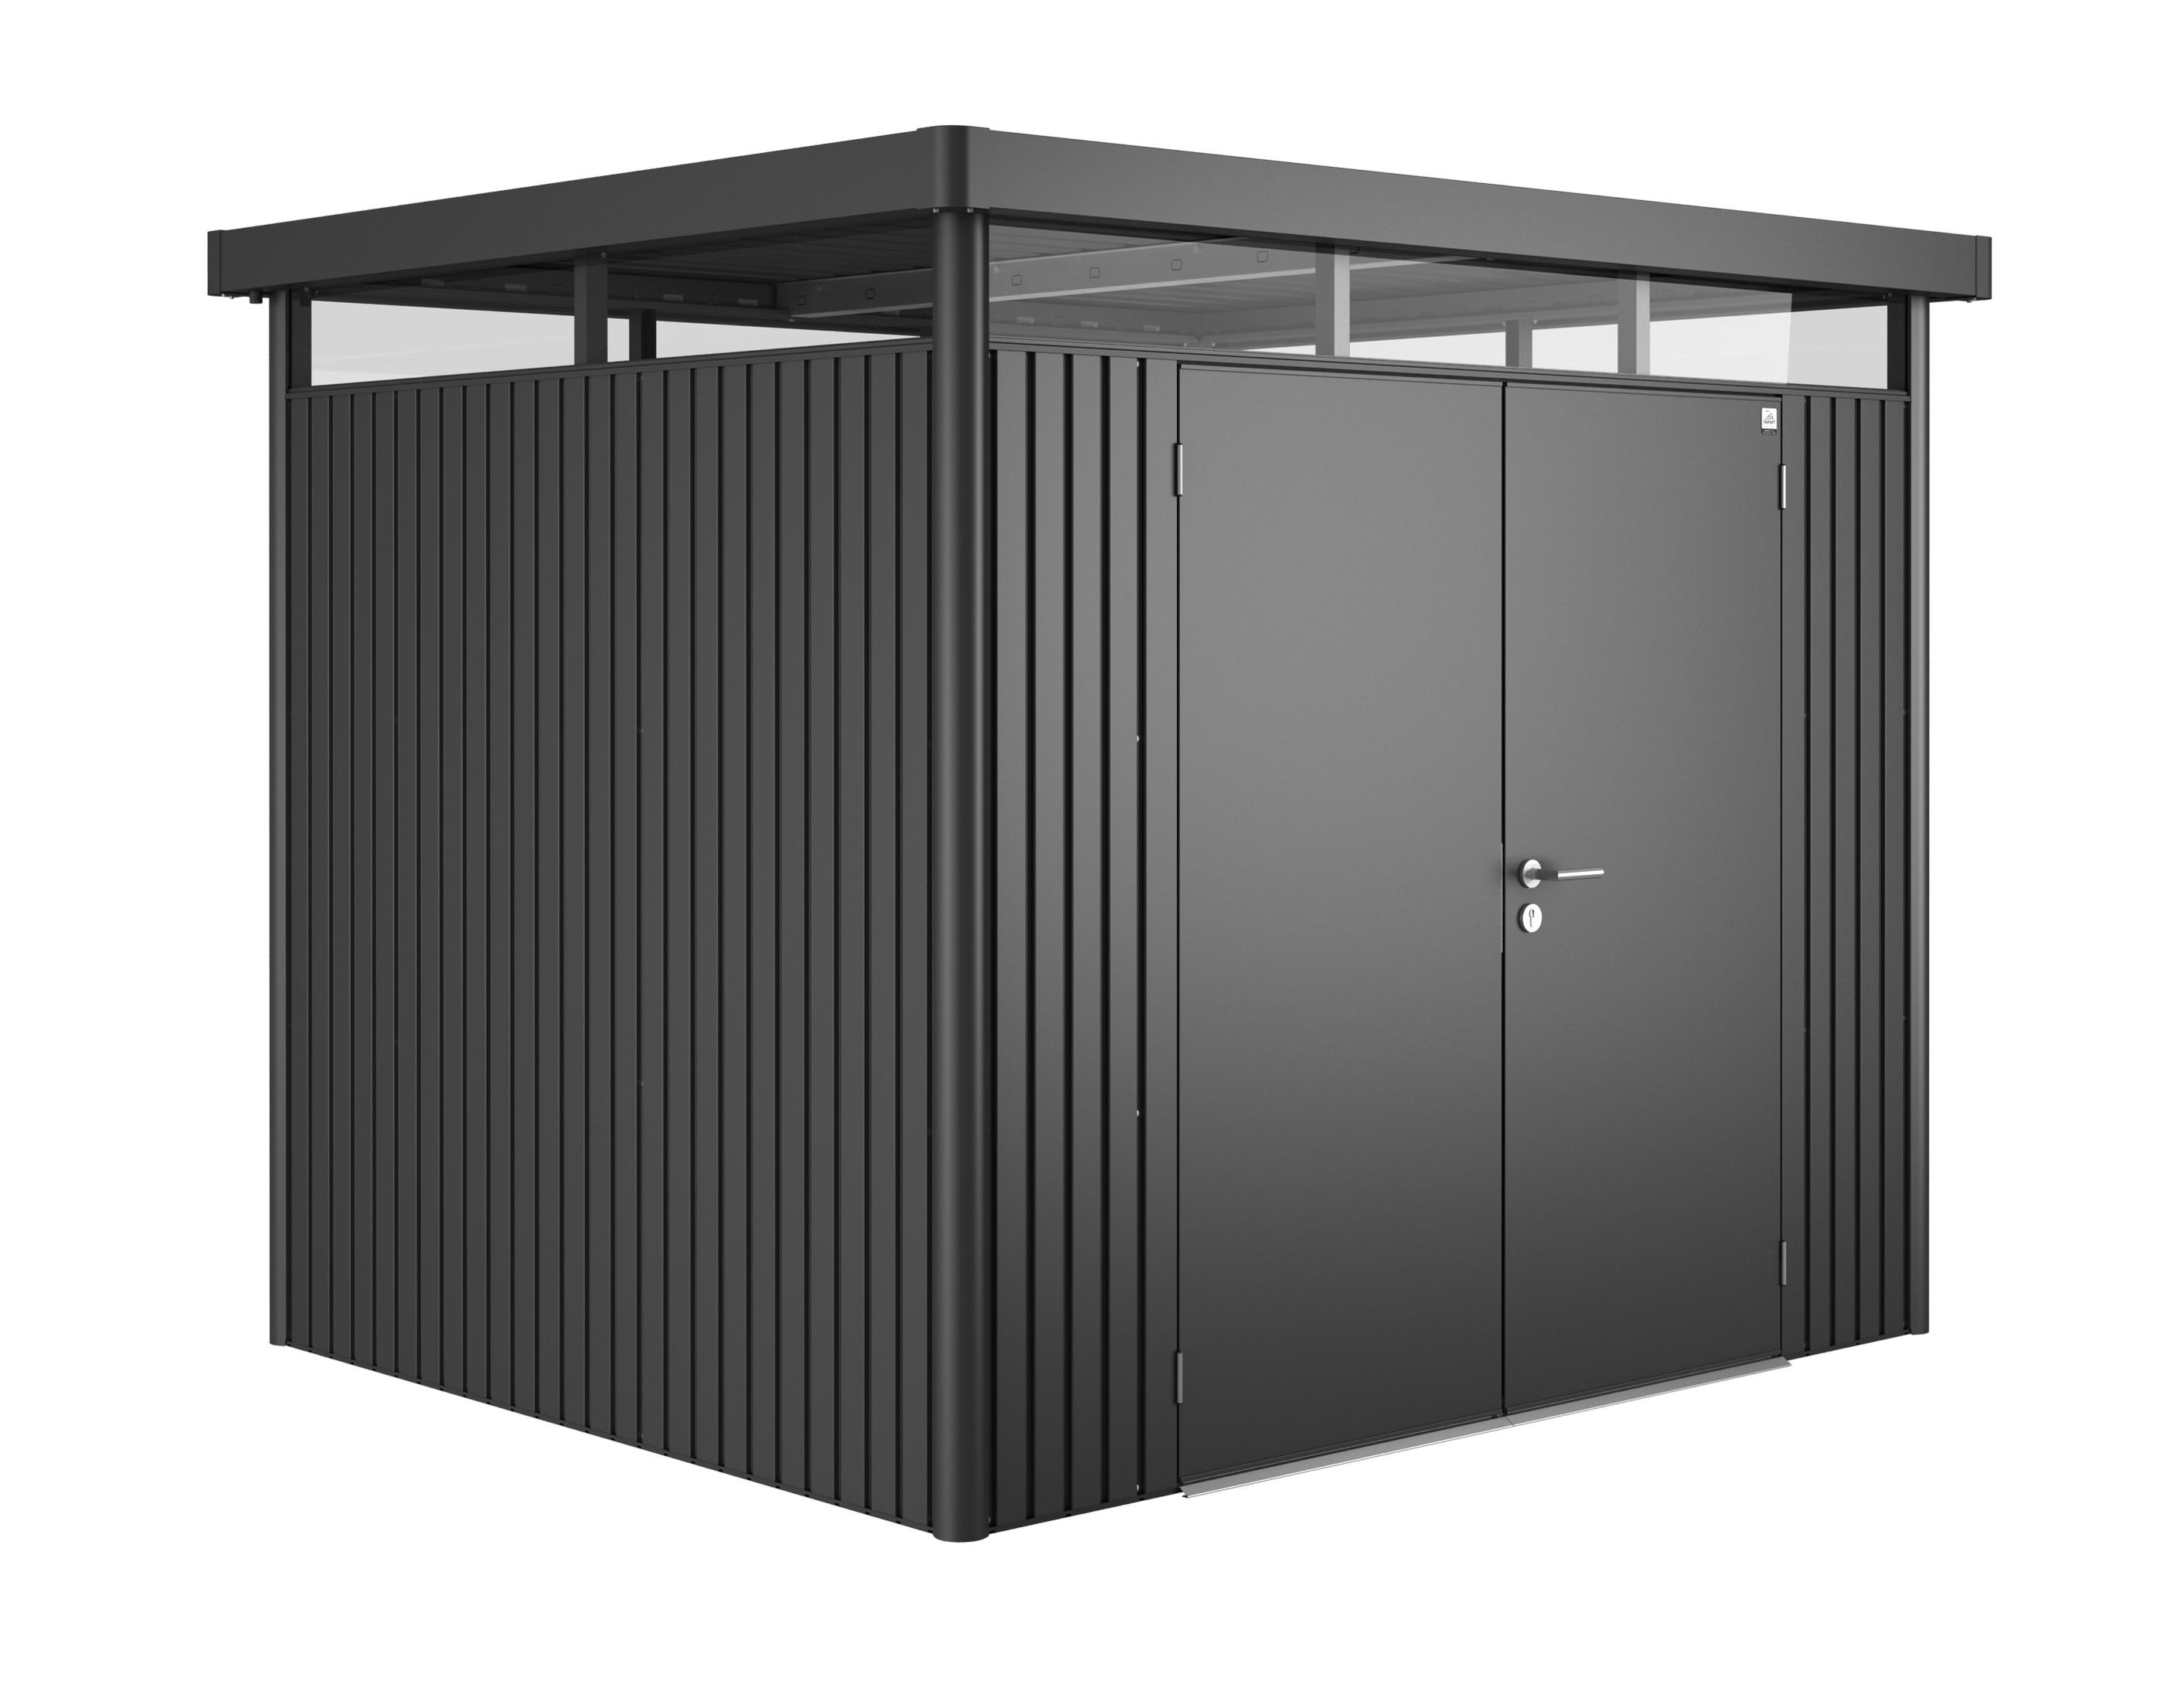 ger tehaus biohort highline h3 dunkelgrau metallic dt 275x235x222cm bei. Black Bedroom Furniture Sets. Home Design Ideas